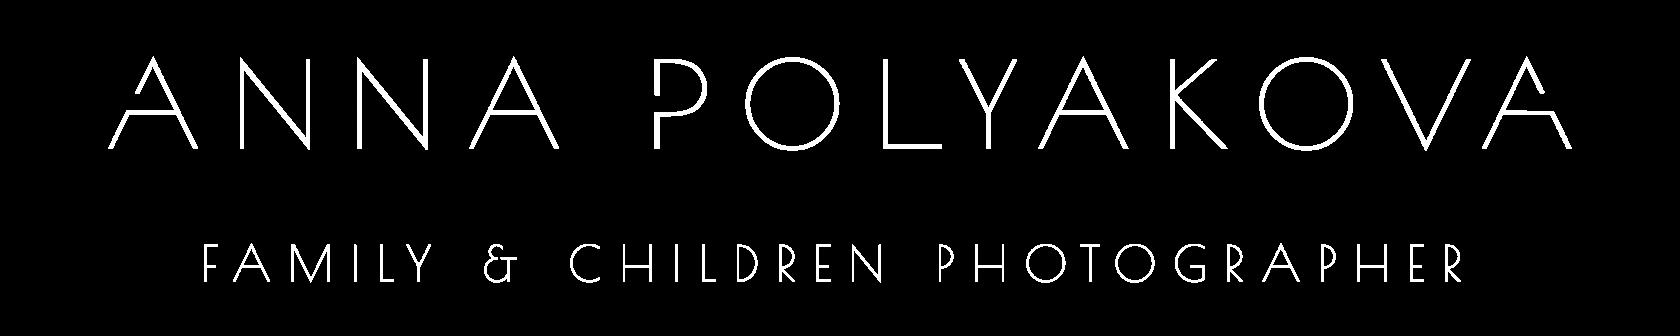 Anna Polyakova детский фотограф в Москве